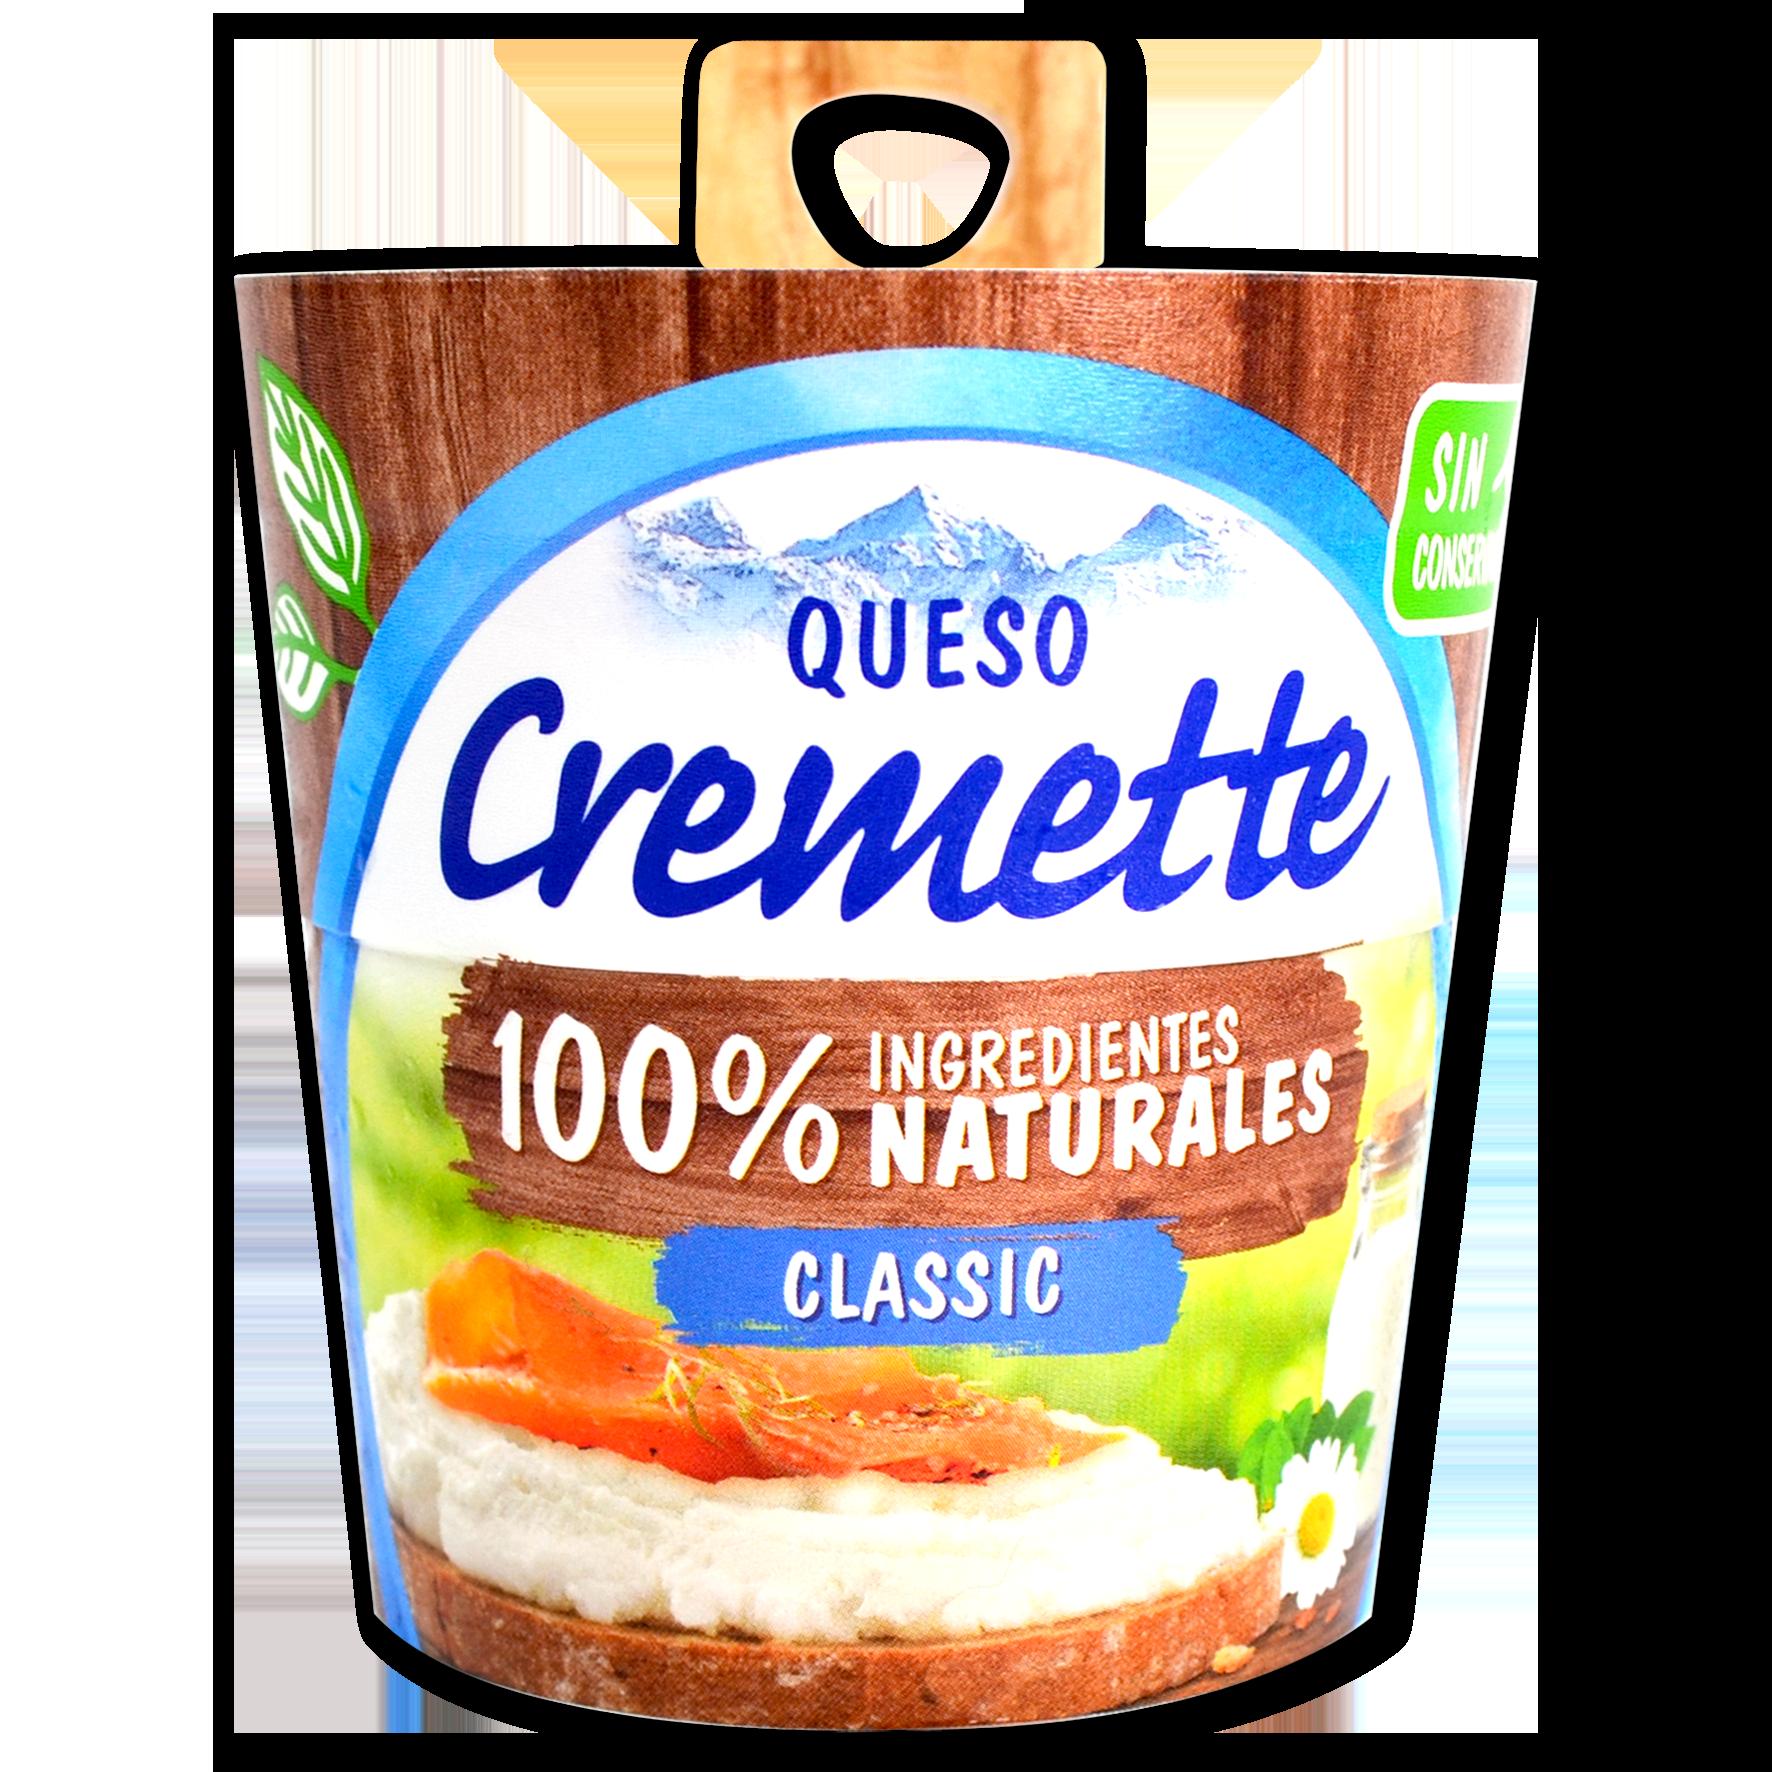 Formatge Cremette natural premium